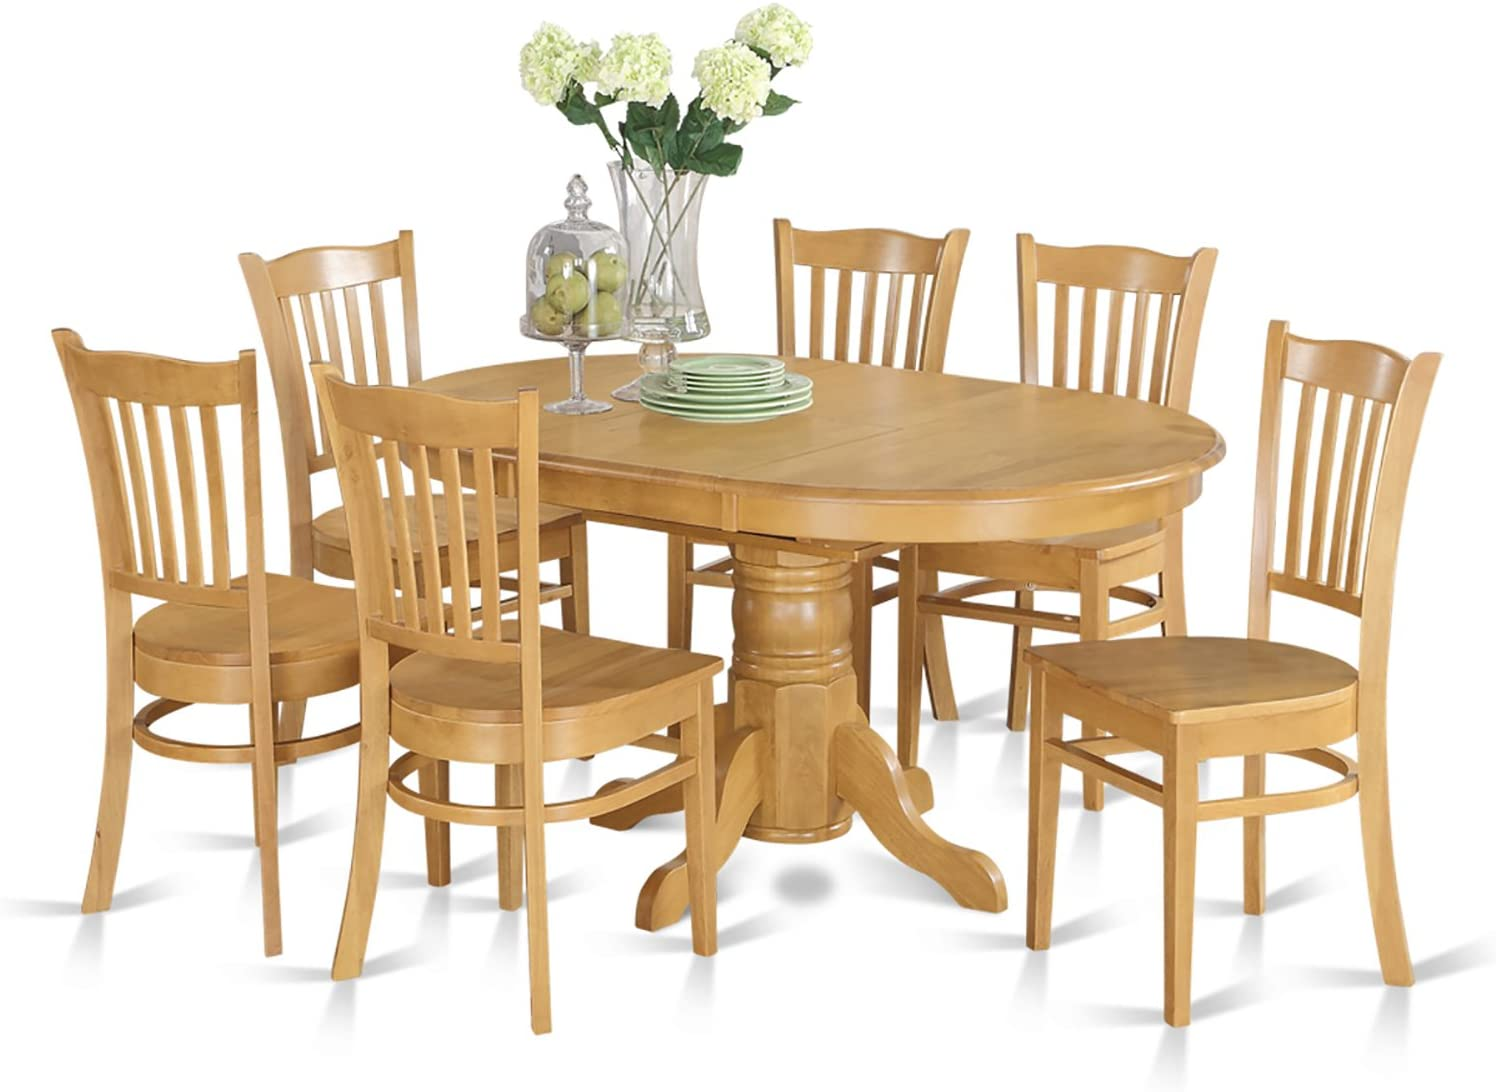 Buy East West Furniture Dinette set 9 Fantastic wood dining chairs ...